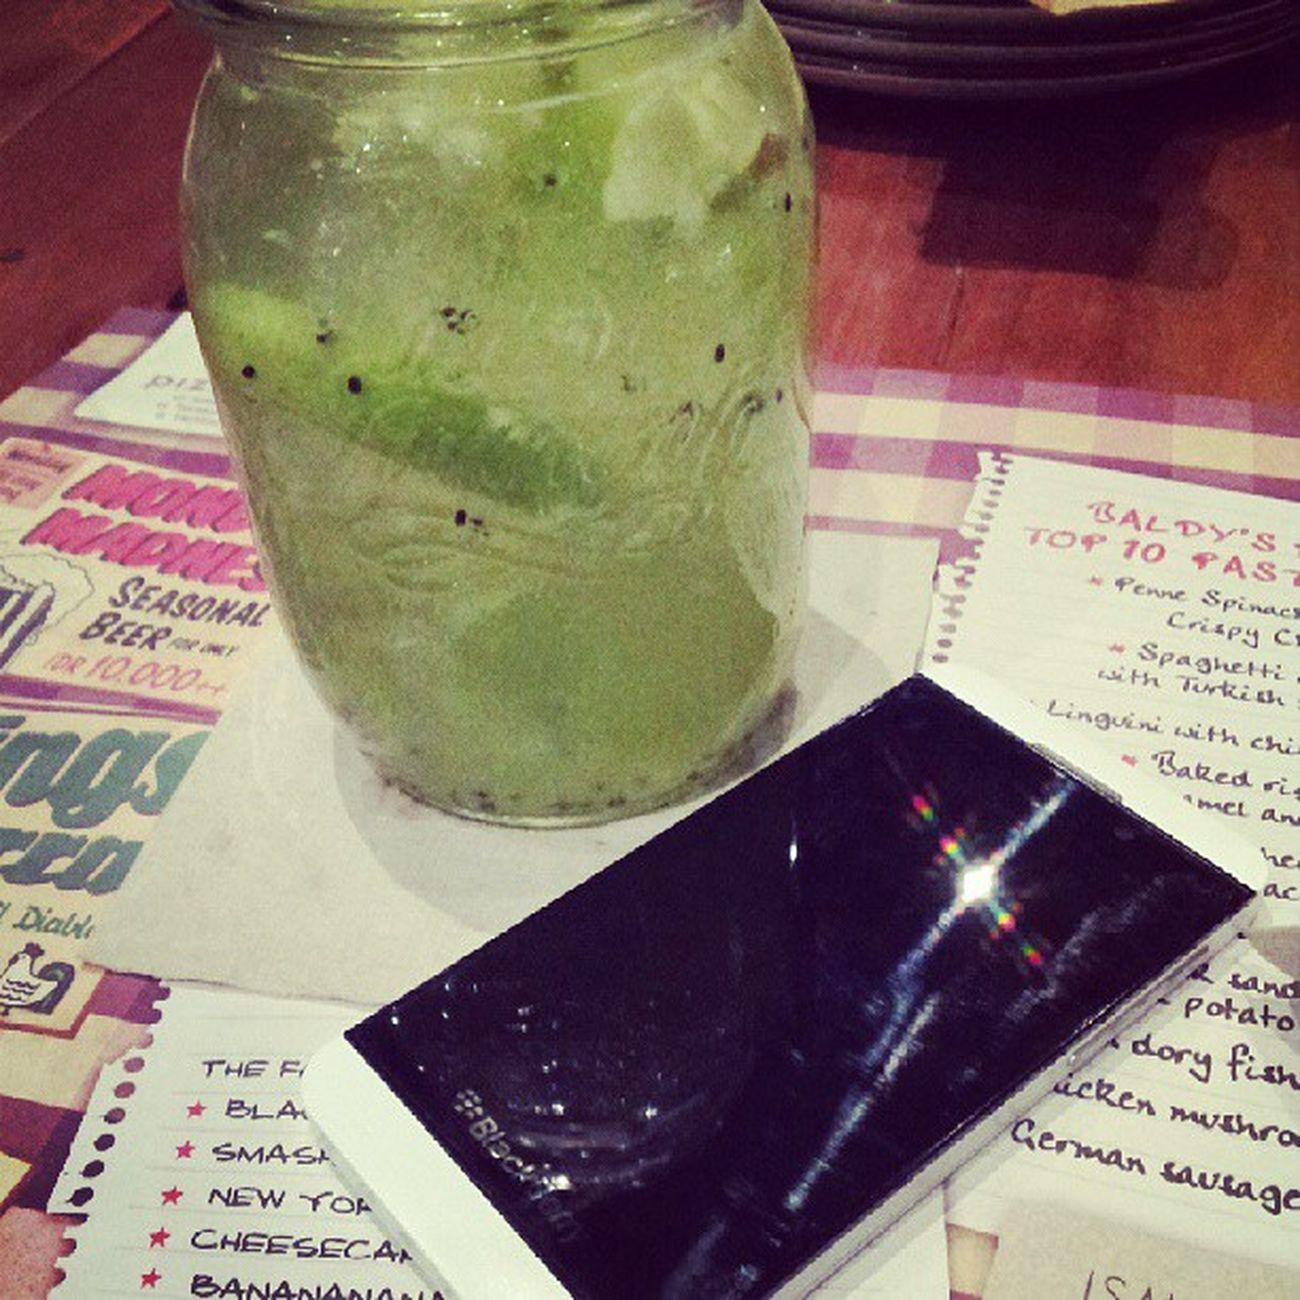 Dinner Pizzaebira GreenApple Drink blackberry z10 white oldfriend instadrink picoftheday camera white